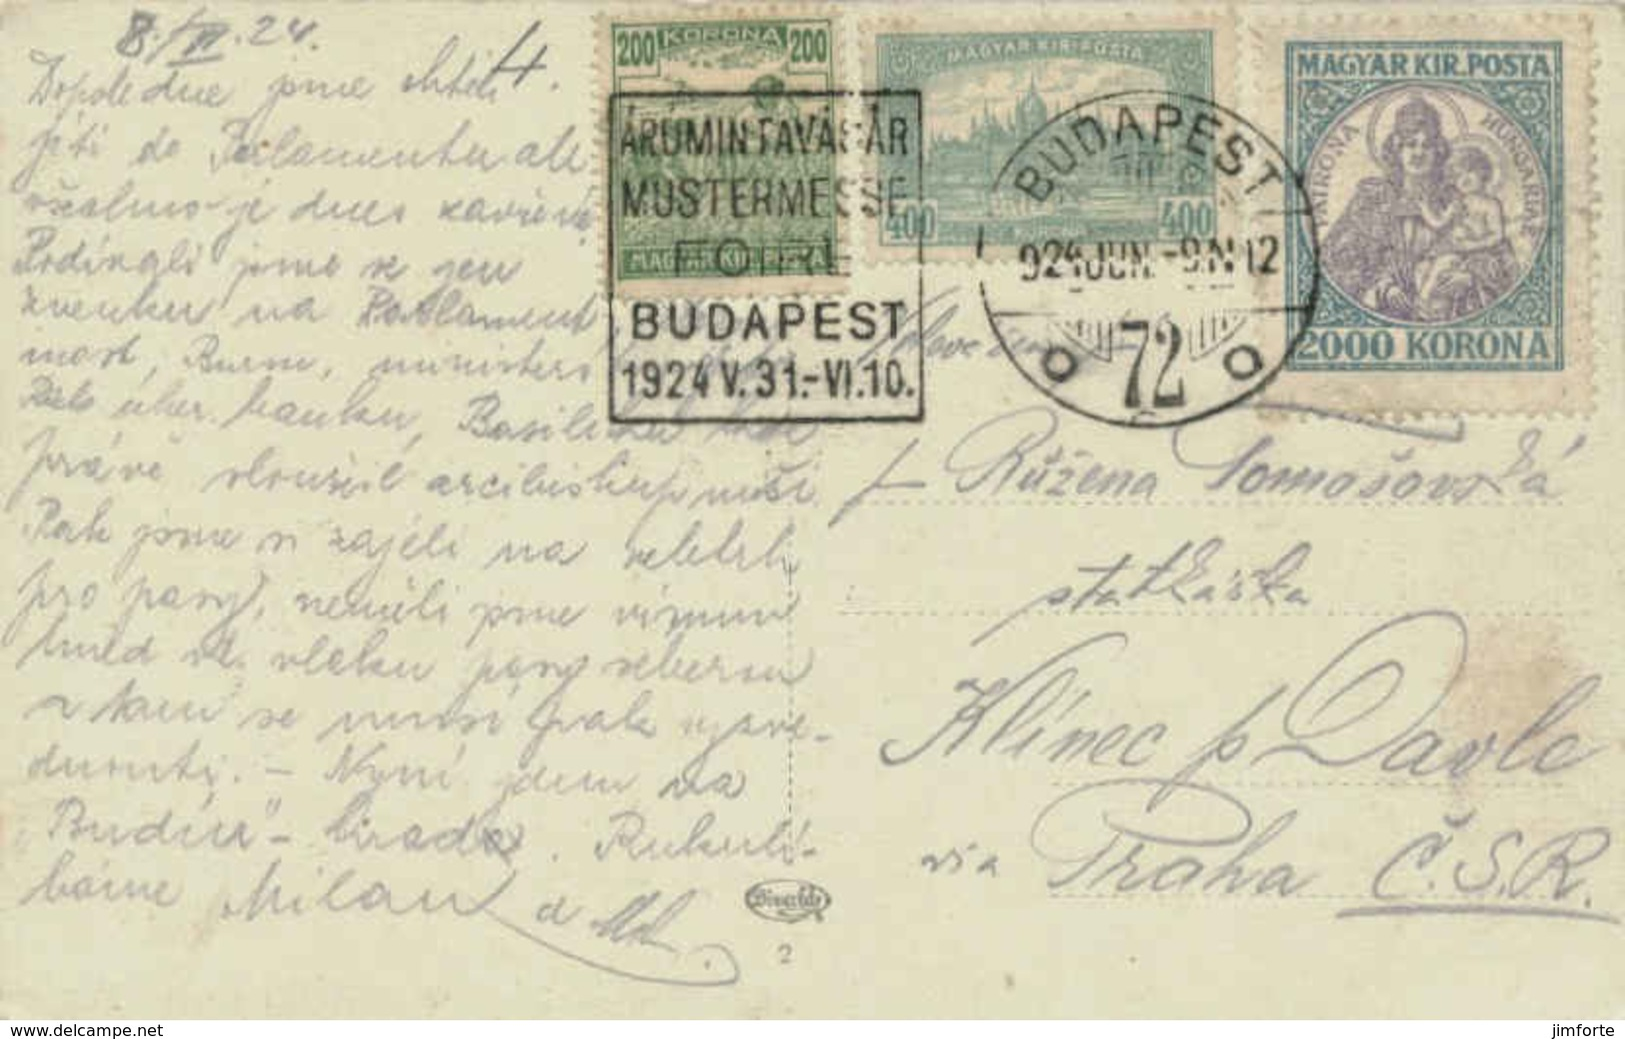 2000K Madonna And Child With 400K Parliament Building And 200K Harvesting Wheat 1924 Budapest, 72 Arumintavasar Mu... - Hungary